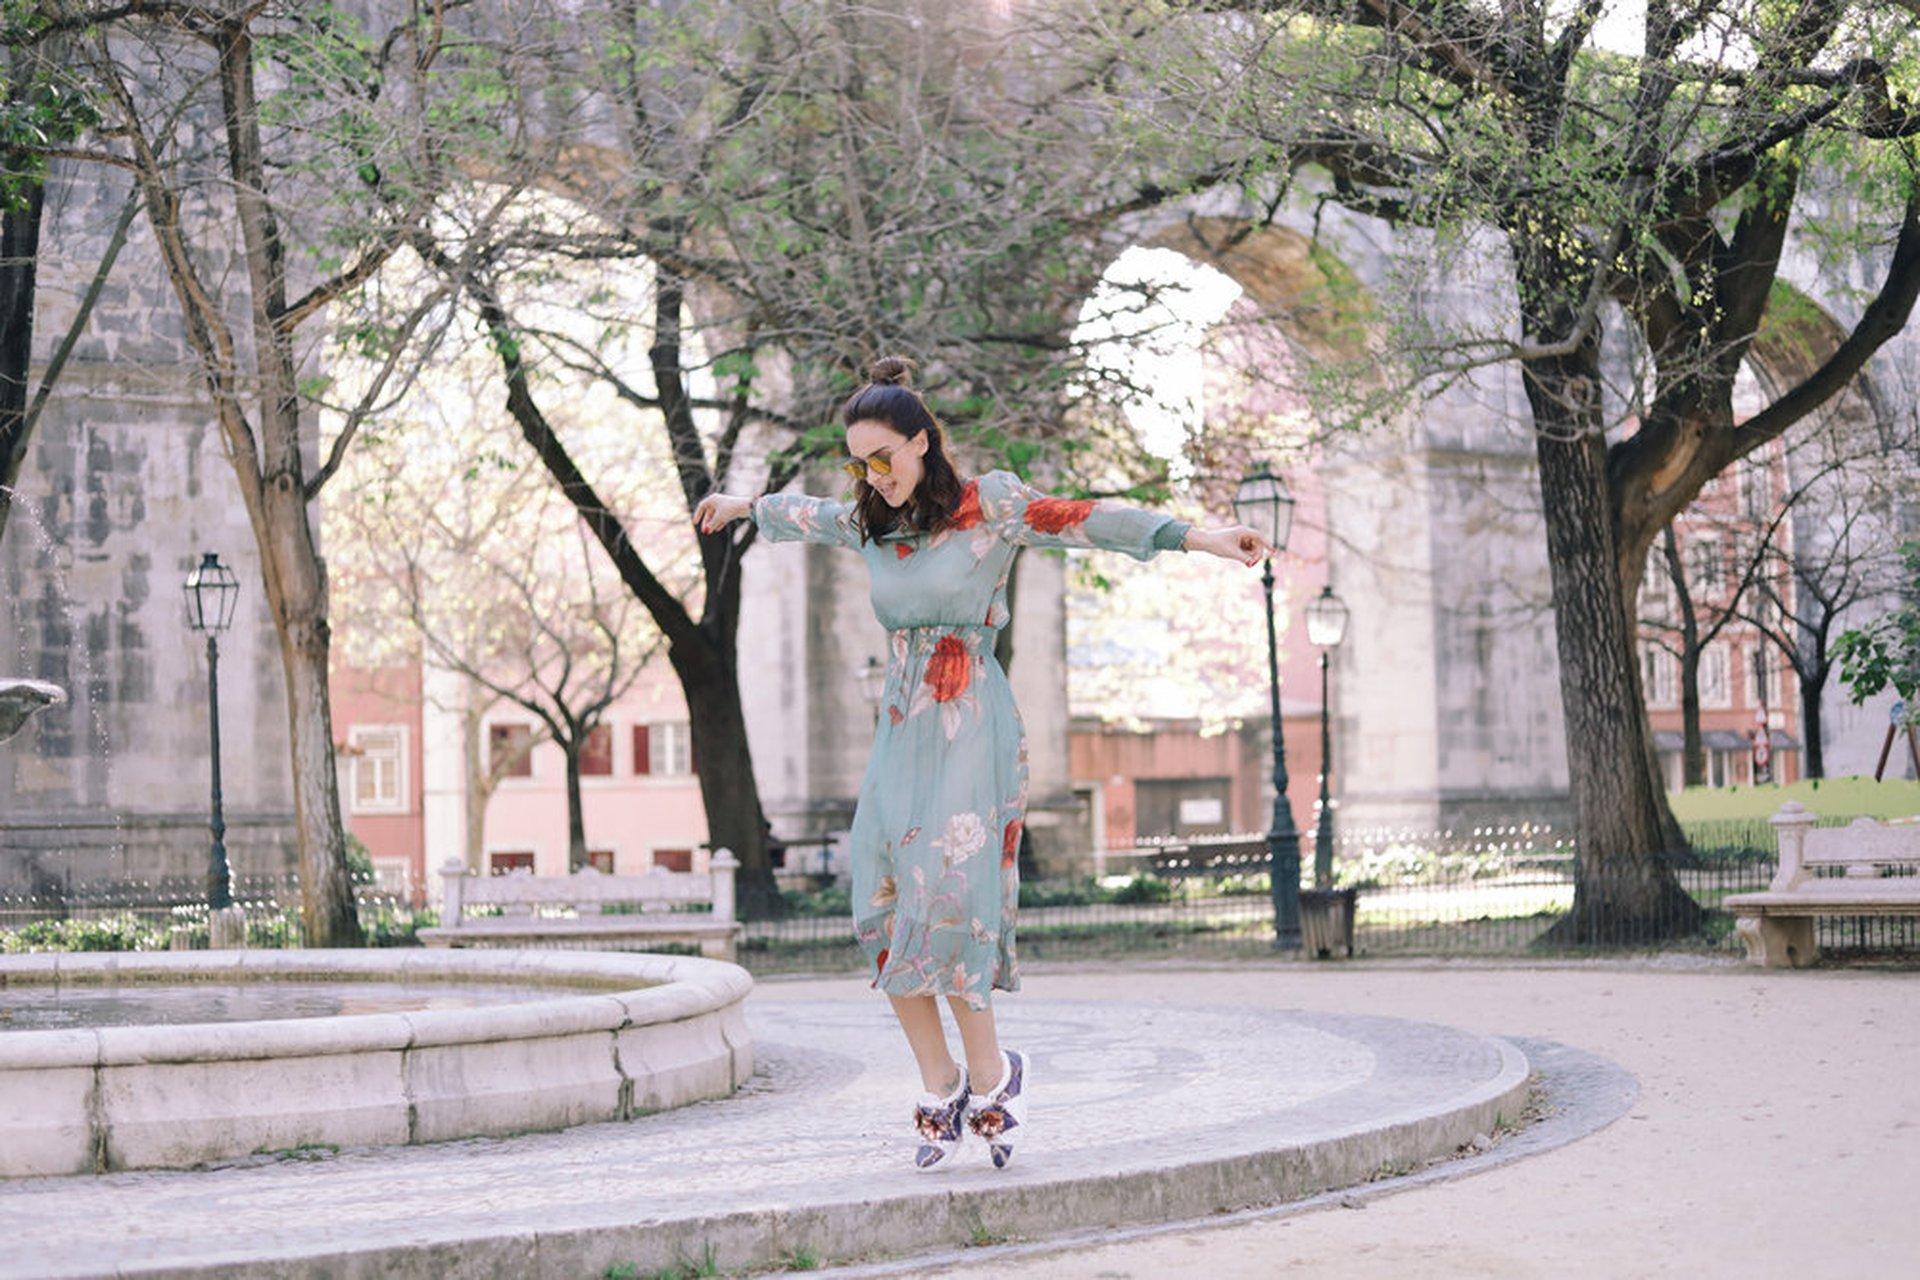 Goncalo S.'s Portfolio - Image 1